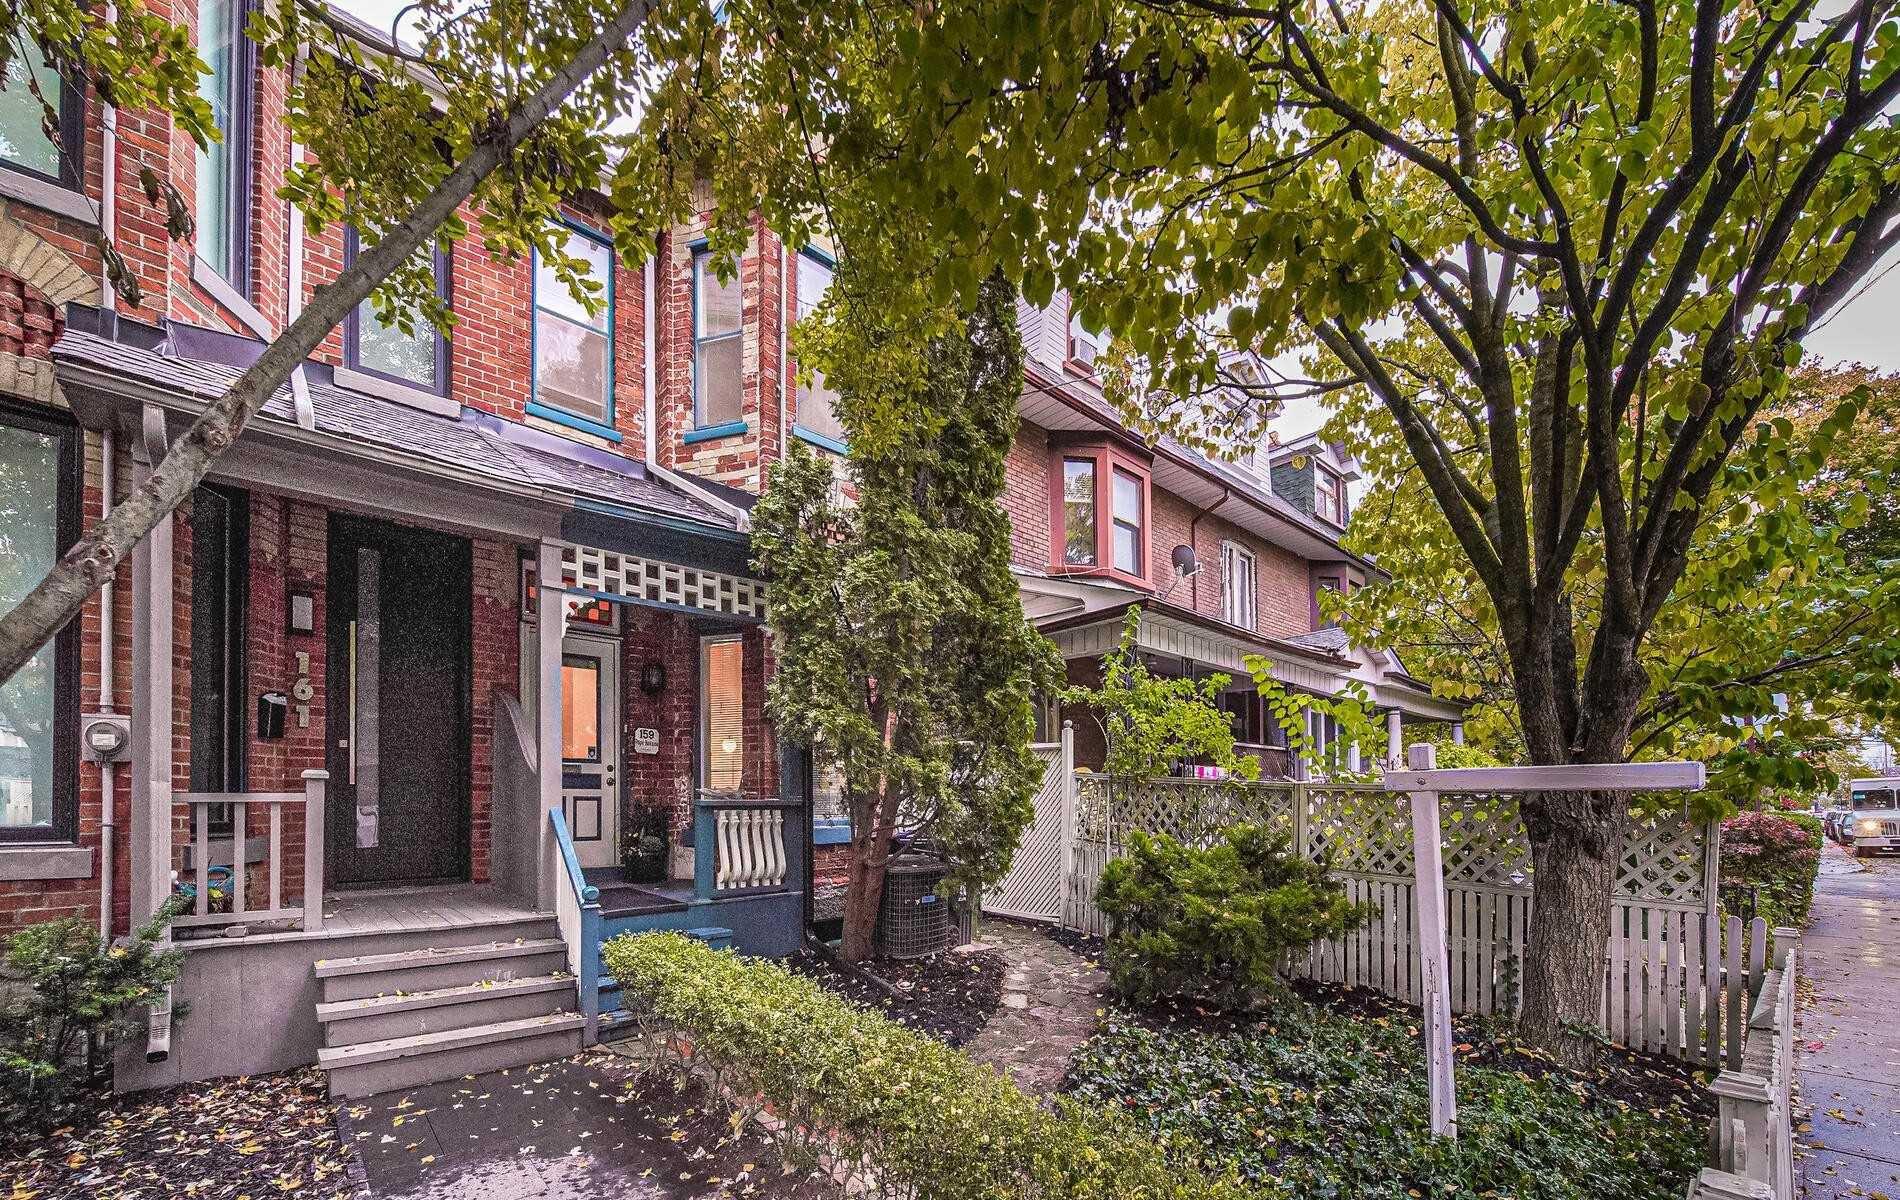 Main Photo: 159 Pape Avenue in Toronto: South Riverdale House (2 1/2 Storey) for sale (Toronto E01)  : MLS®# E4960066